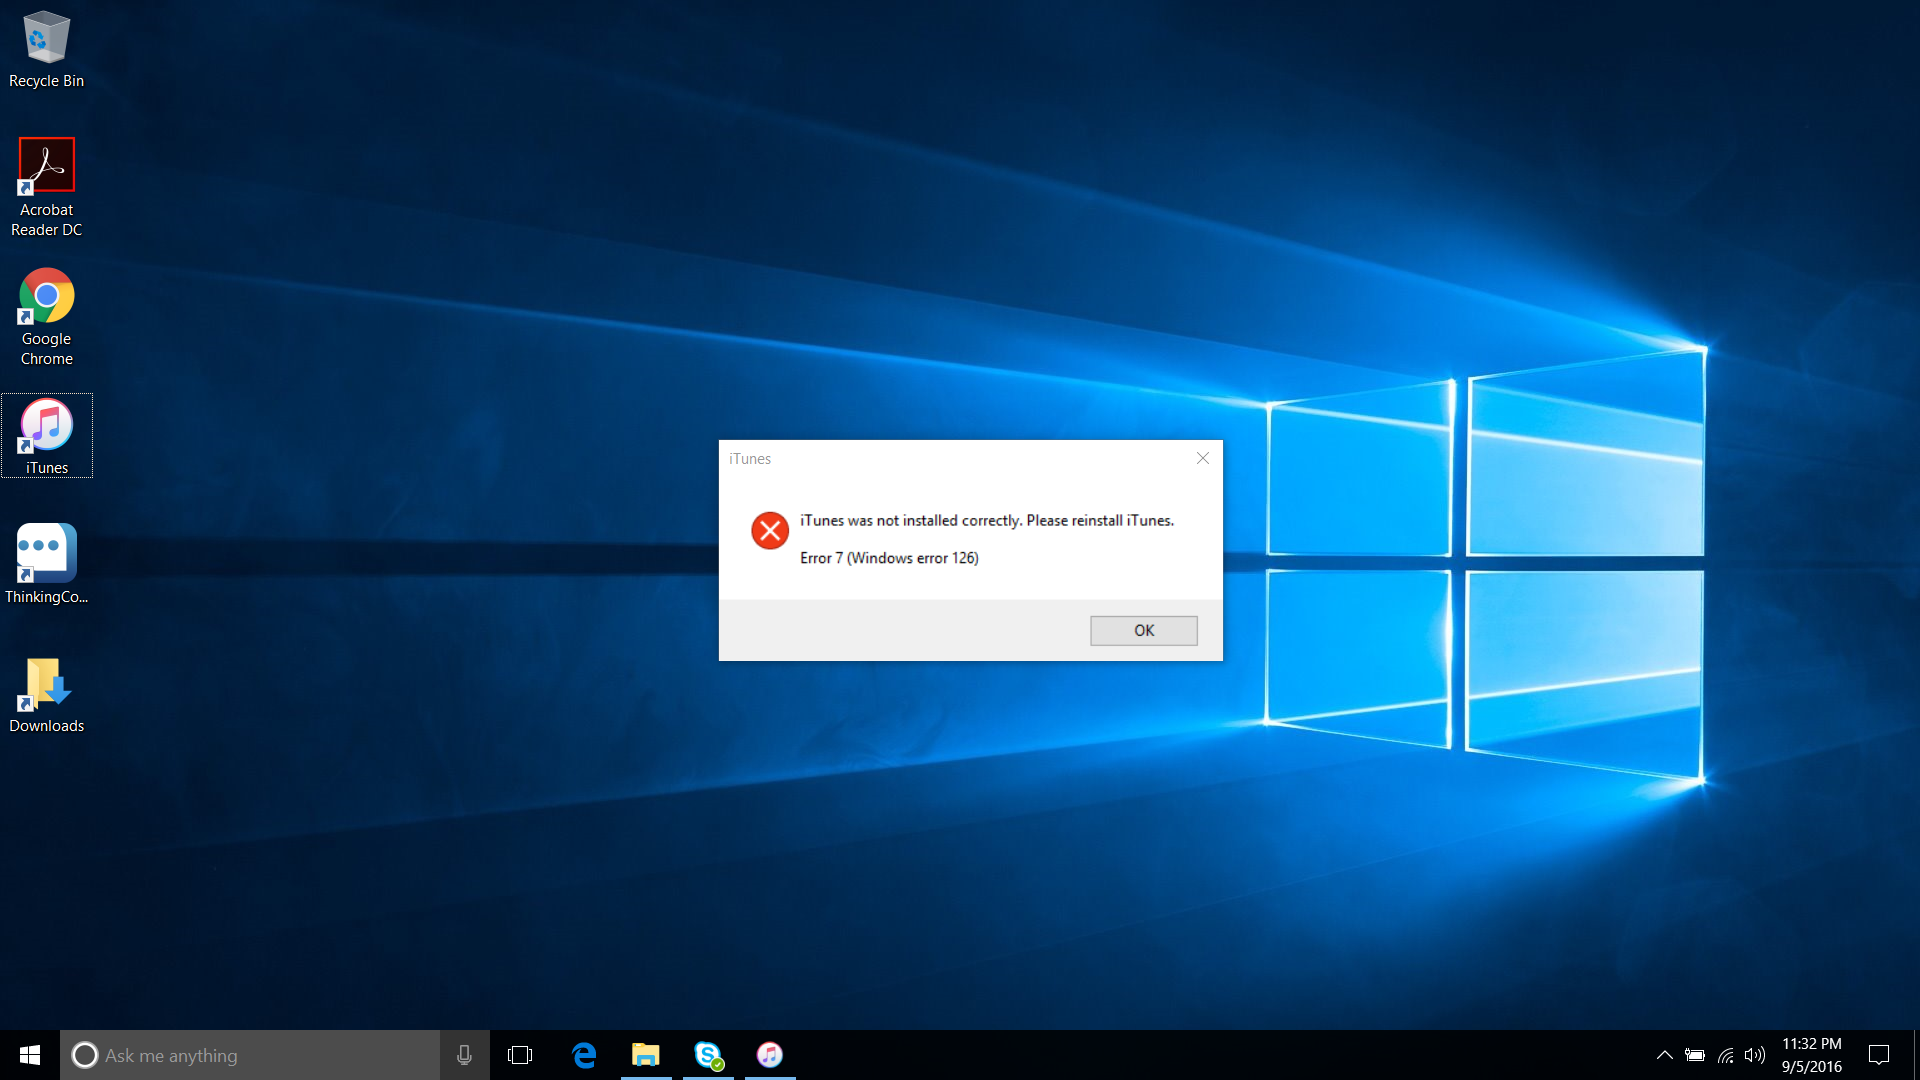 Windows 10 Please reinstall itunes error … - Apple Community